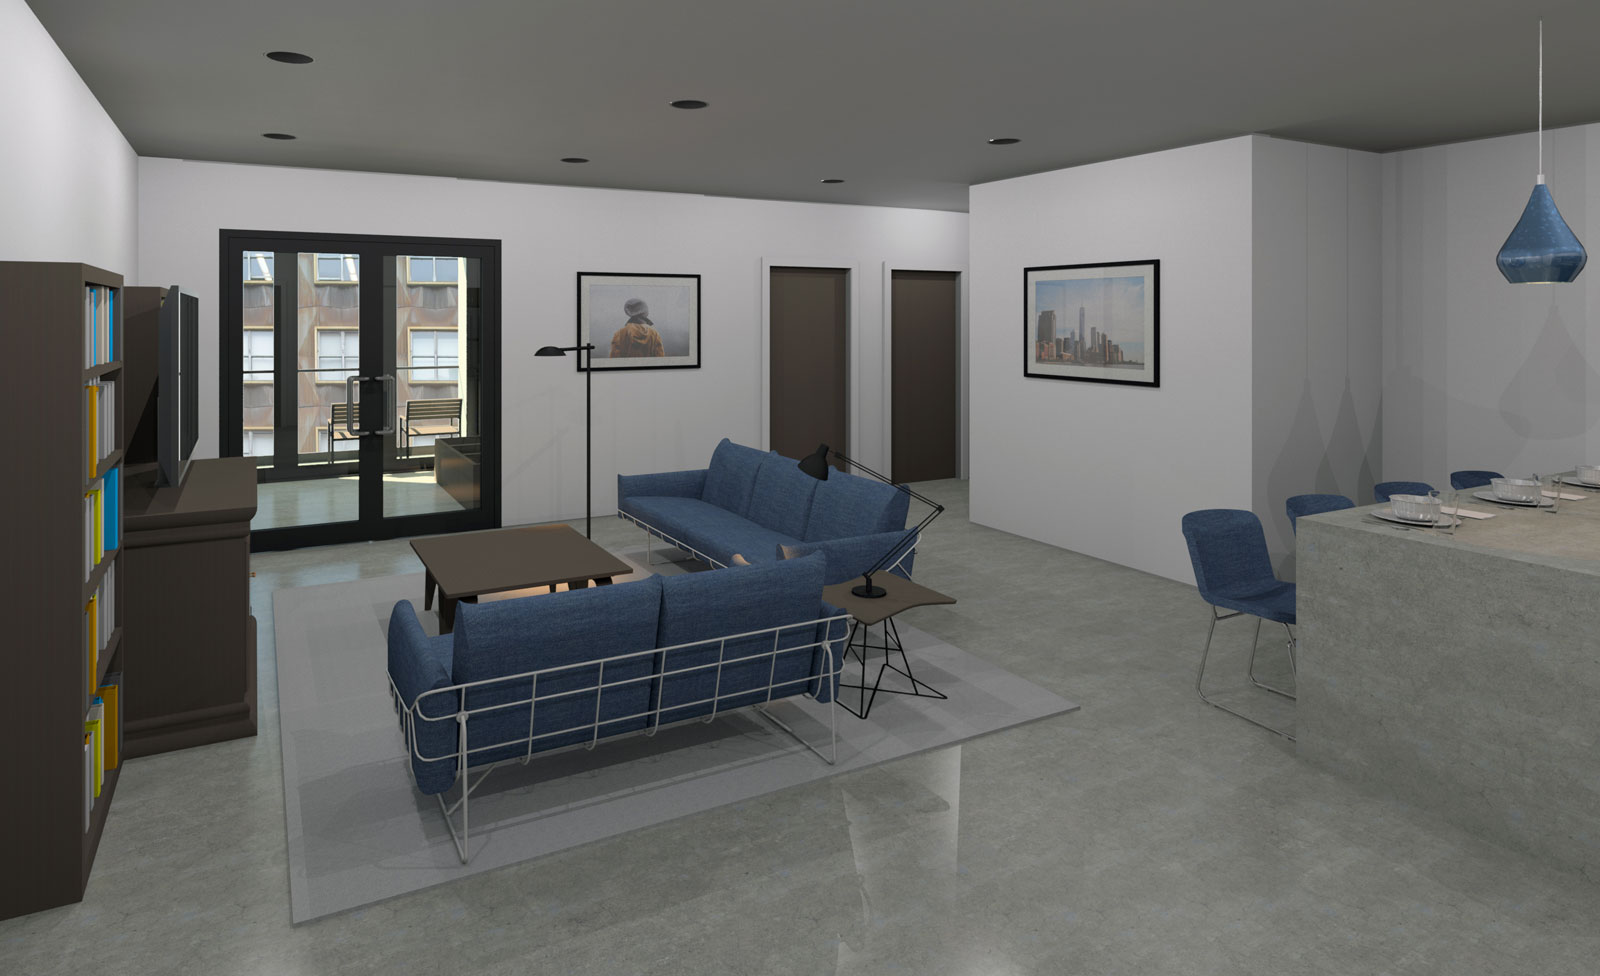 2 Bedroom Interior Post Processed 02